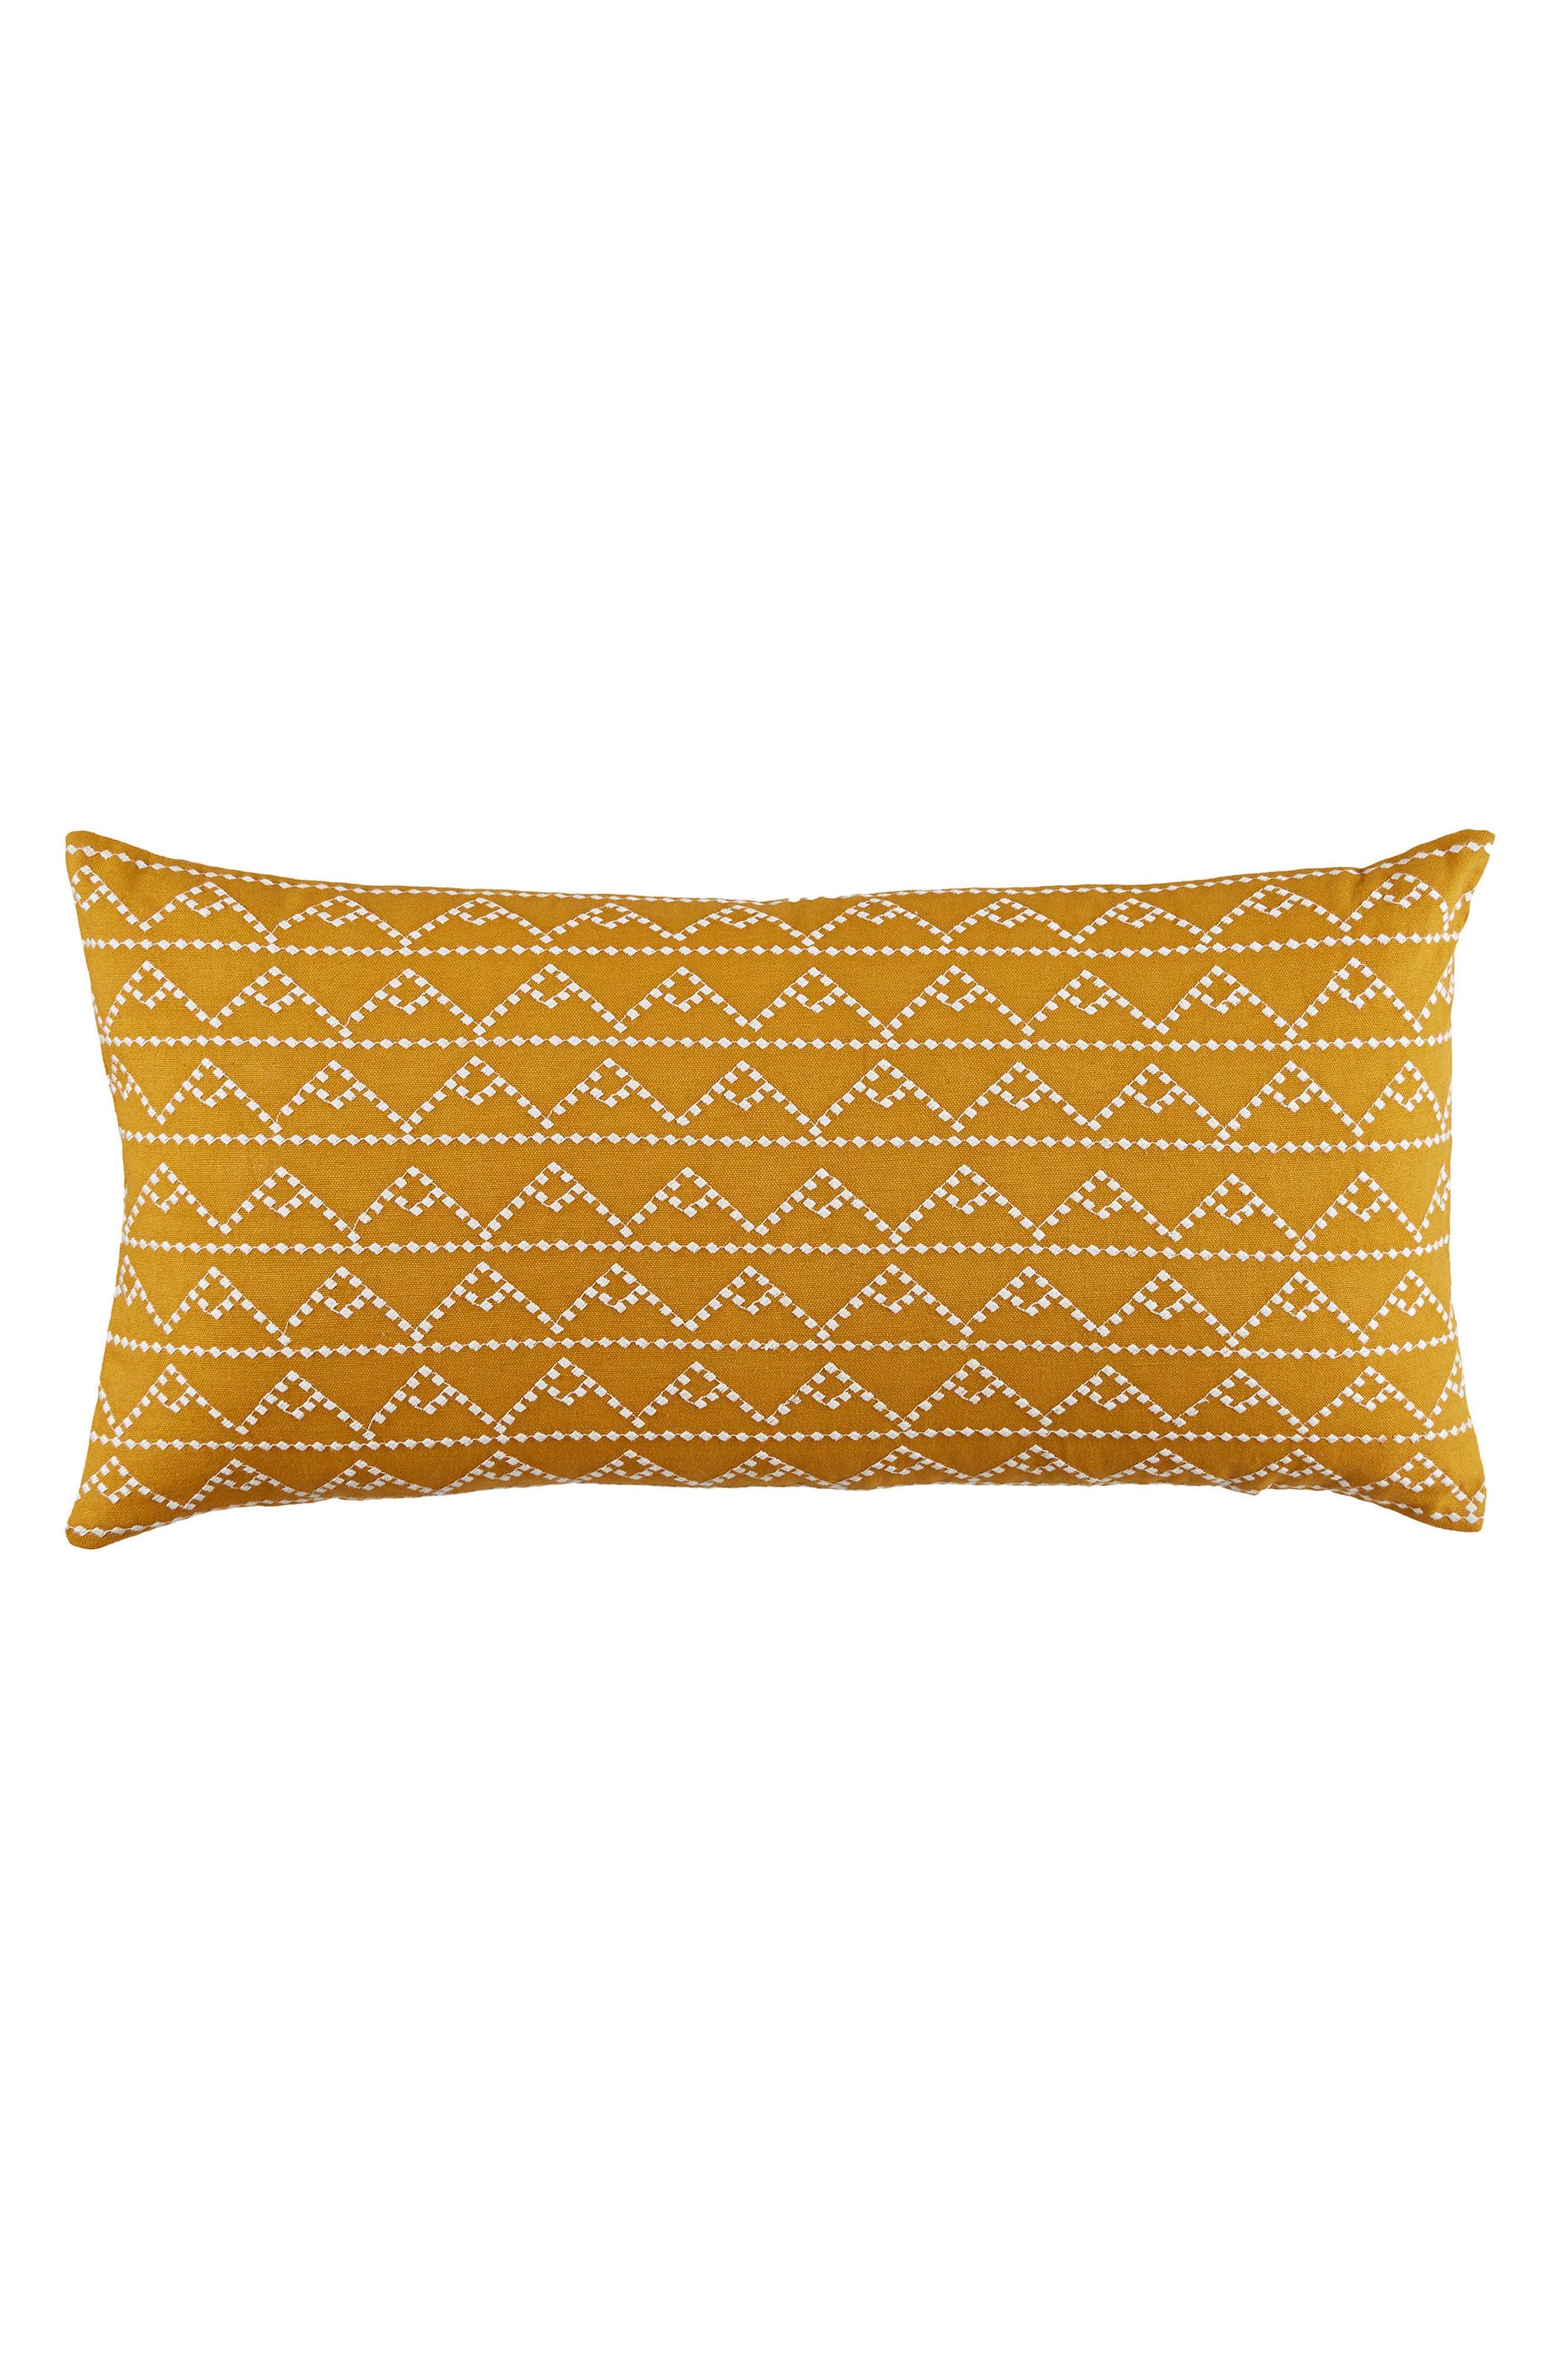 Modern Pyramid Accent Pillow,                             Main thumbnail 1, color,                             710